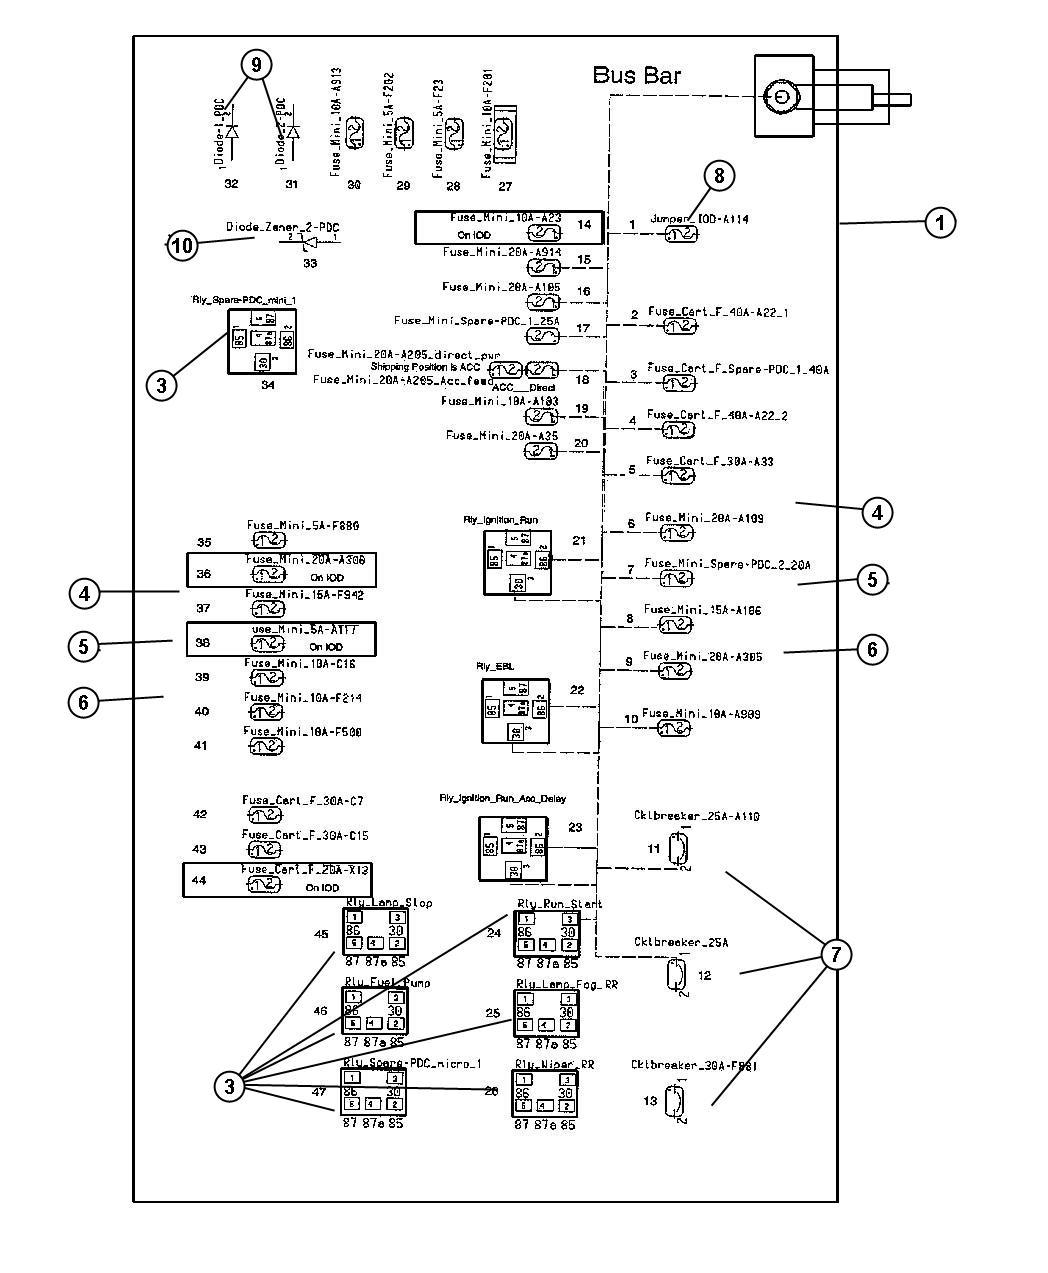 Diagram 2007 Buick Rendezvous Fuse Diagram Full Version Hd Quality Fuse Diagram Nsdiagraml Maglierugbyonline It